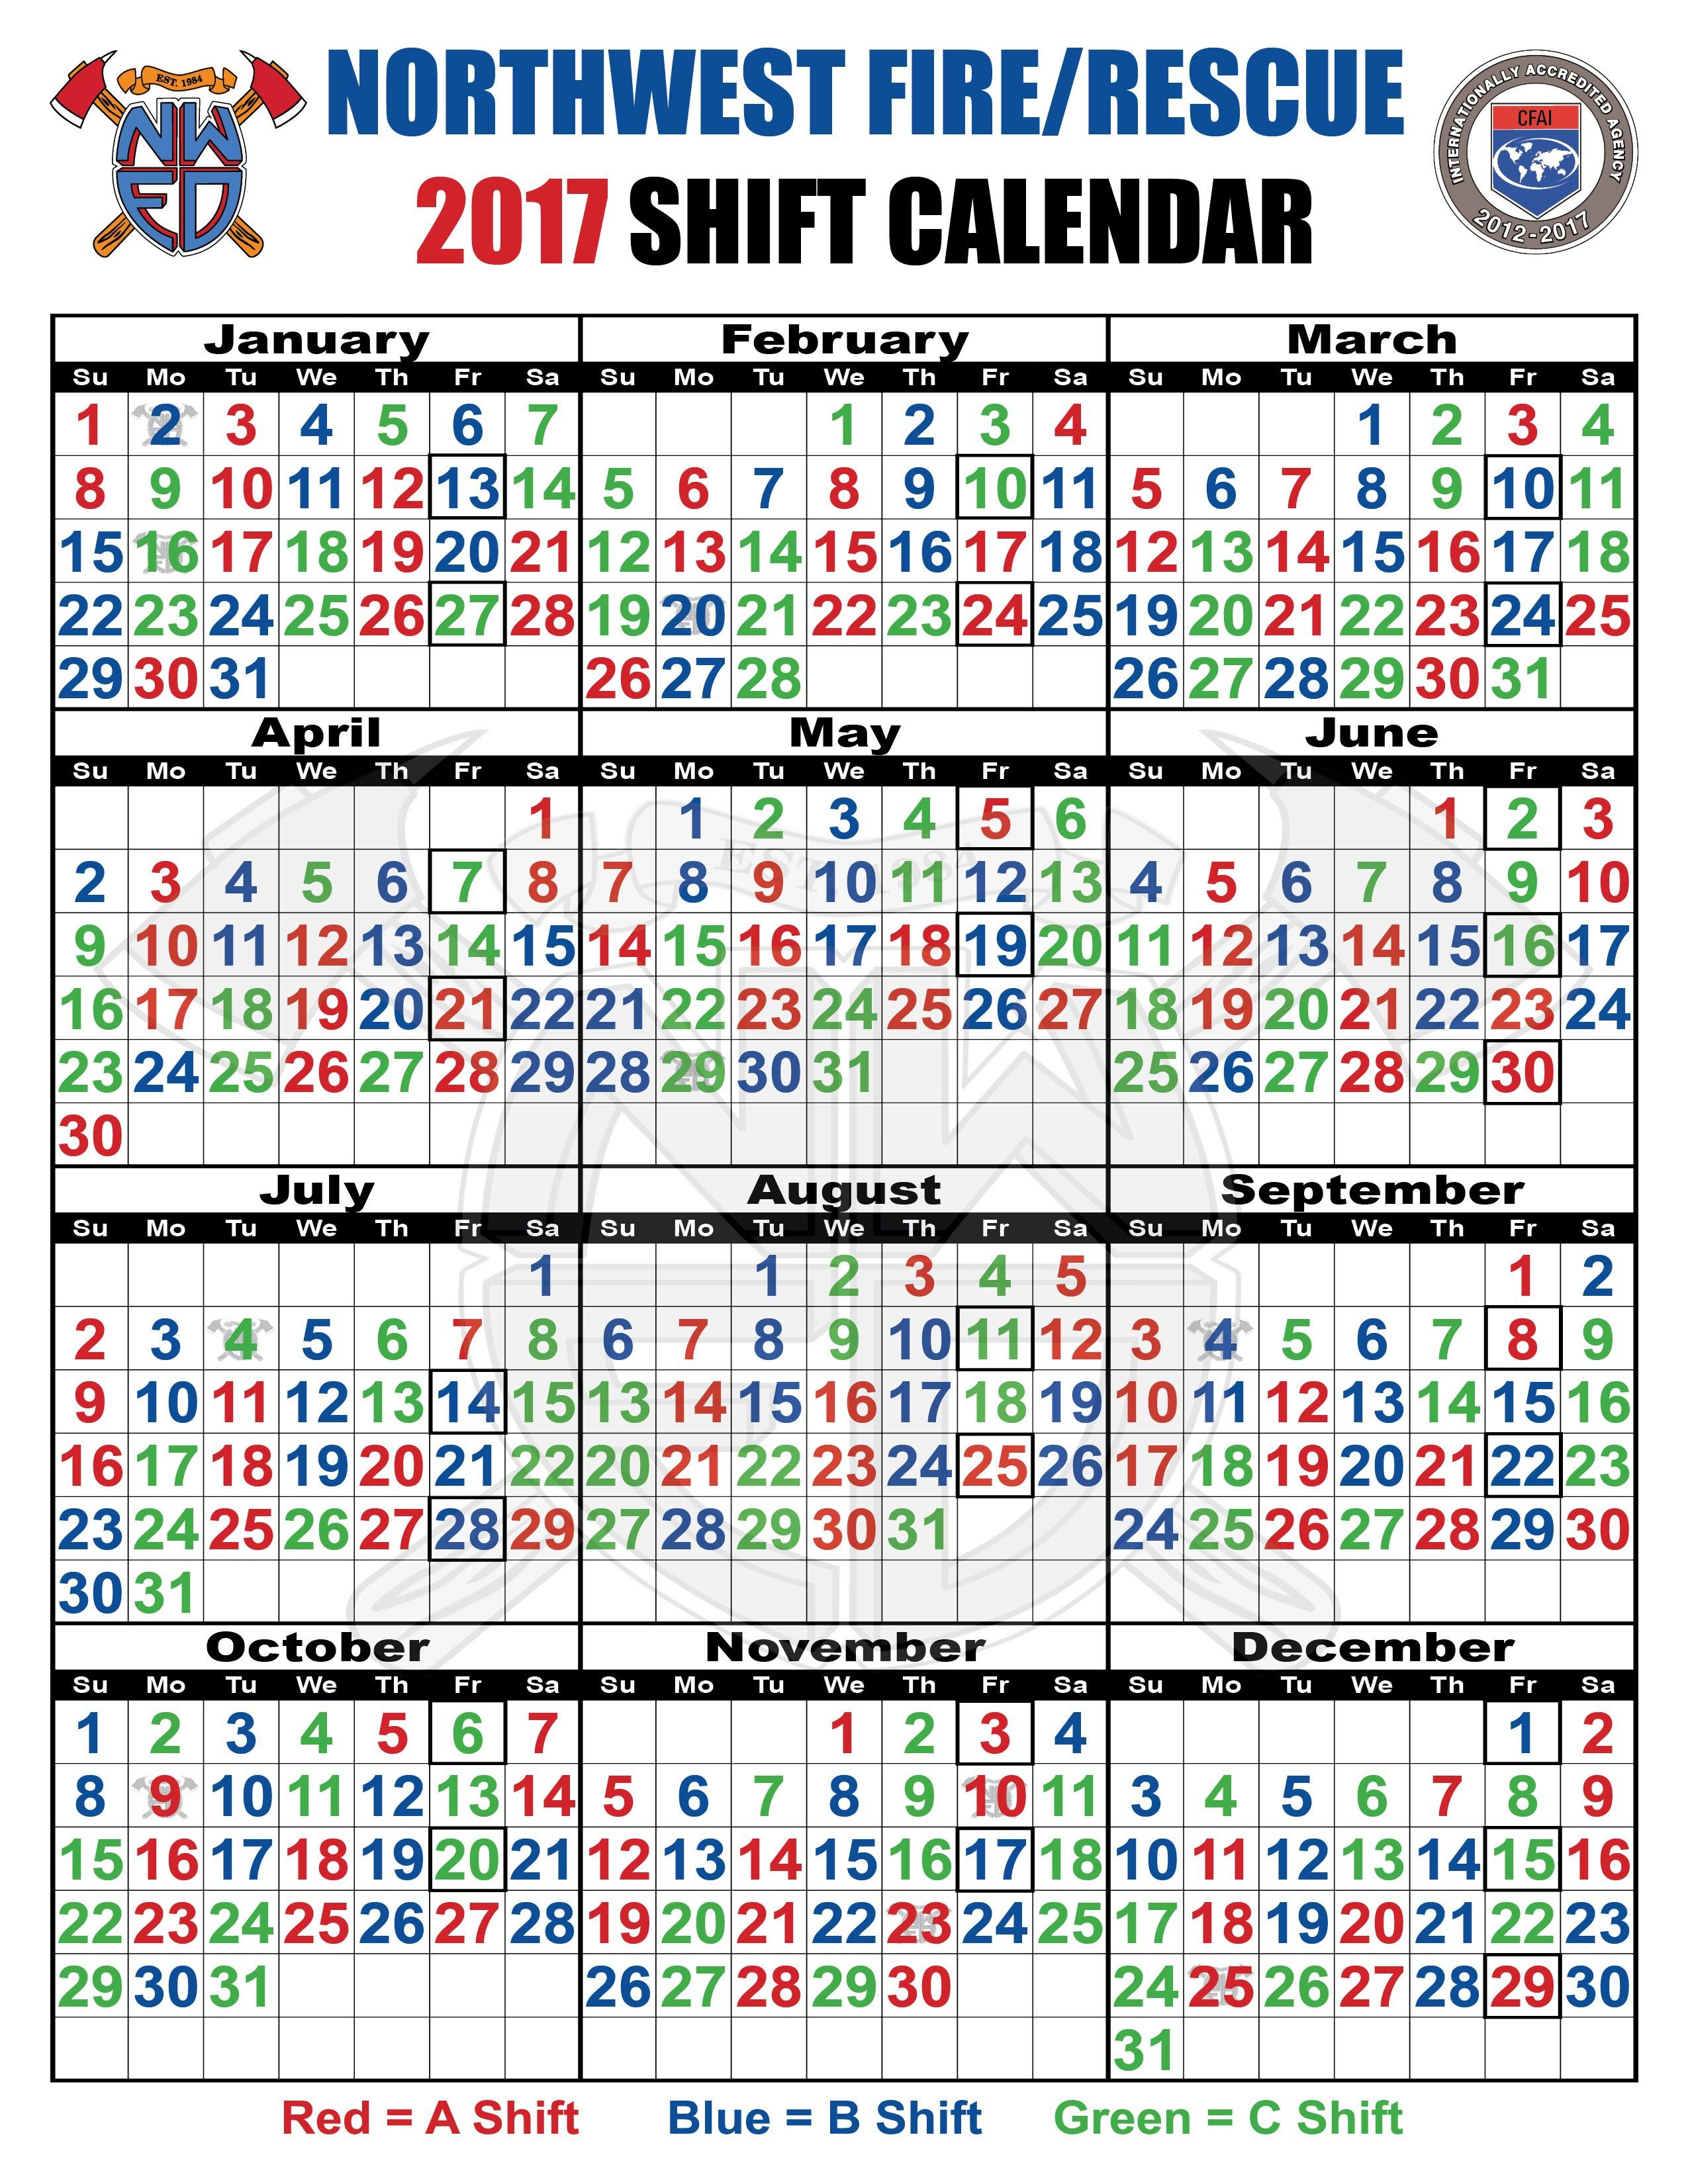 2018 Fire Shift Calendar Printed For Free - Calendaro.download